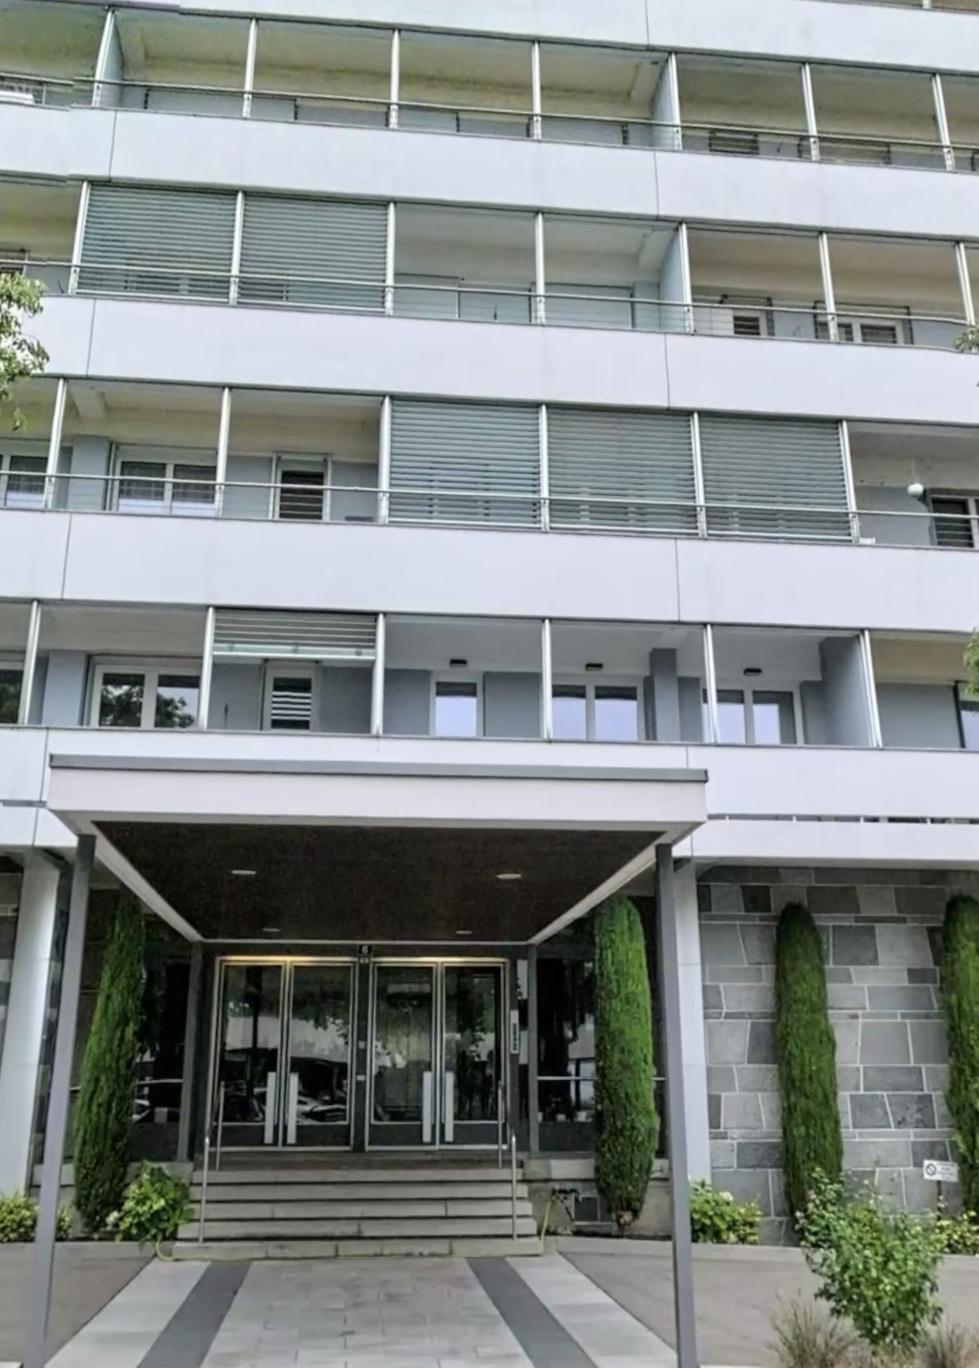 Primerose 6, 1007 Lausanne